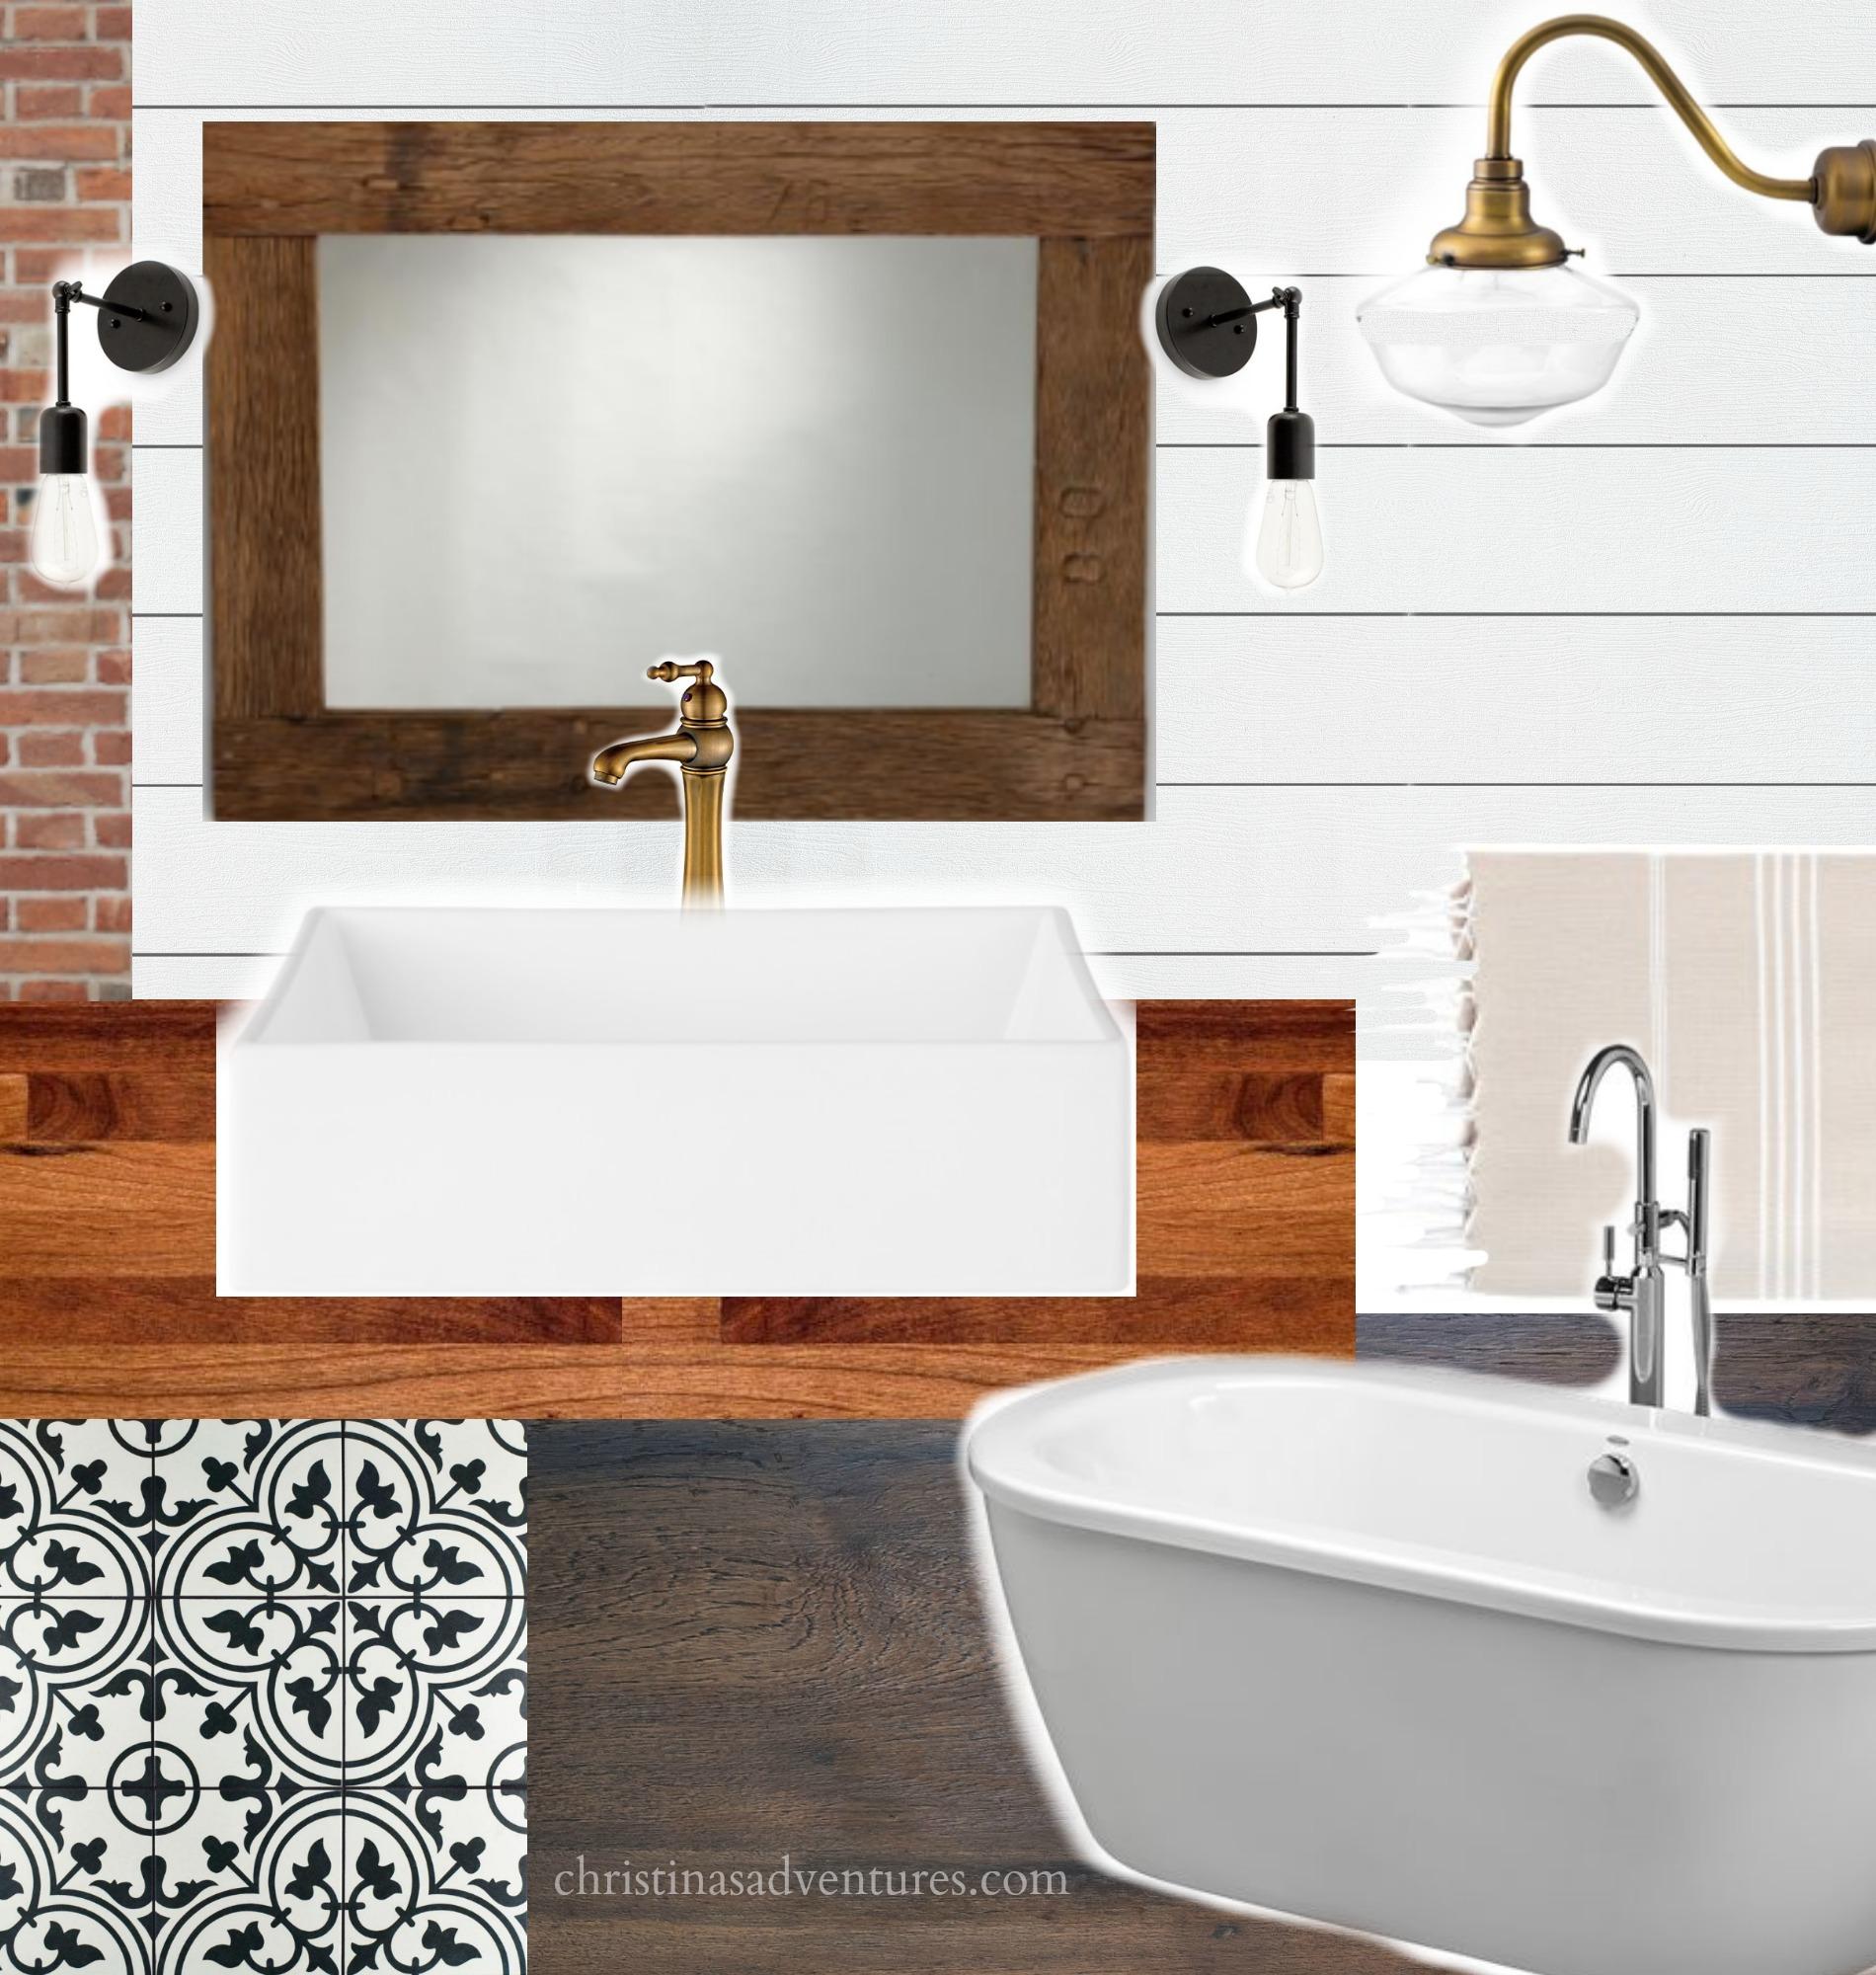 Vintage Inspired Farmhouse Bathroom Plan - ORC Week 1 - Christinas ...